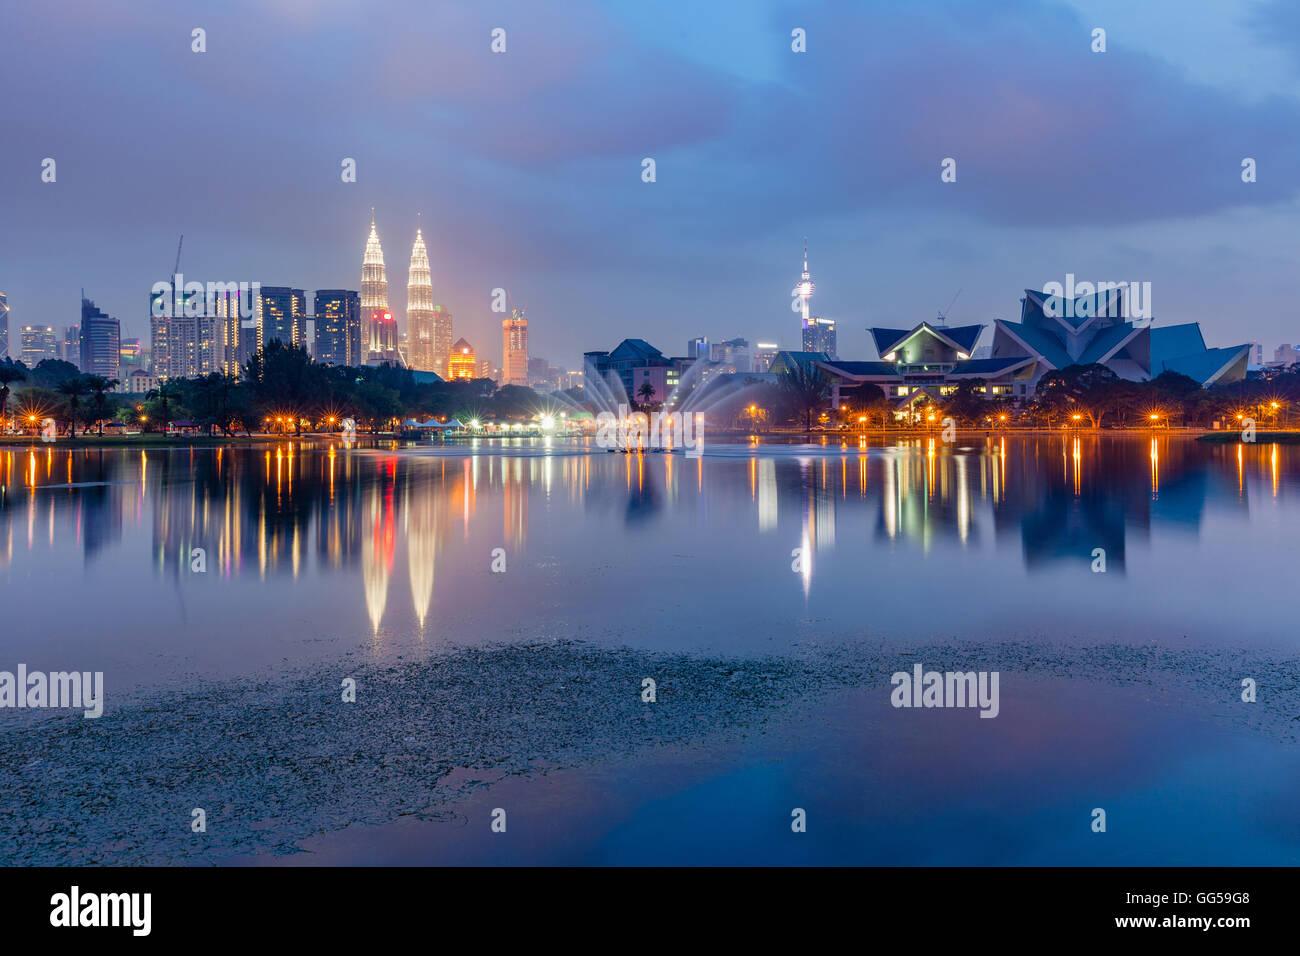 Horizonte de Kuala Lumpur al atardecer visto desde los lagos Titiwangsa, Kuala Lumpur, Malasia Imagen De Stock